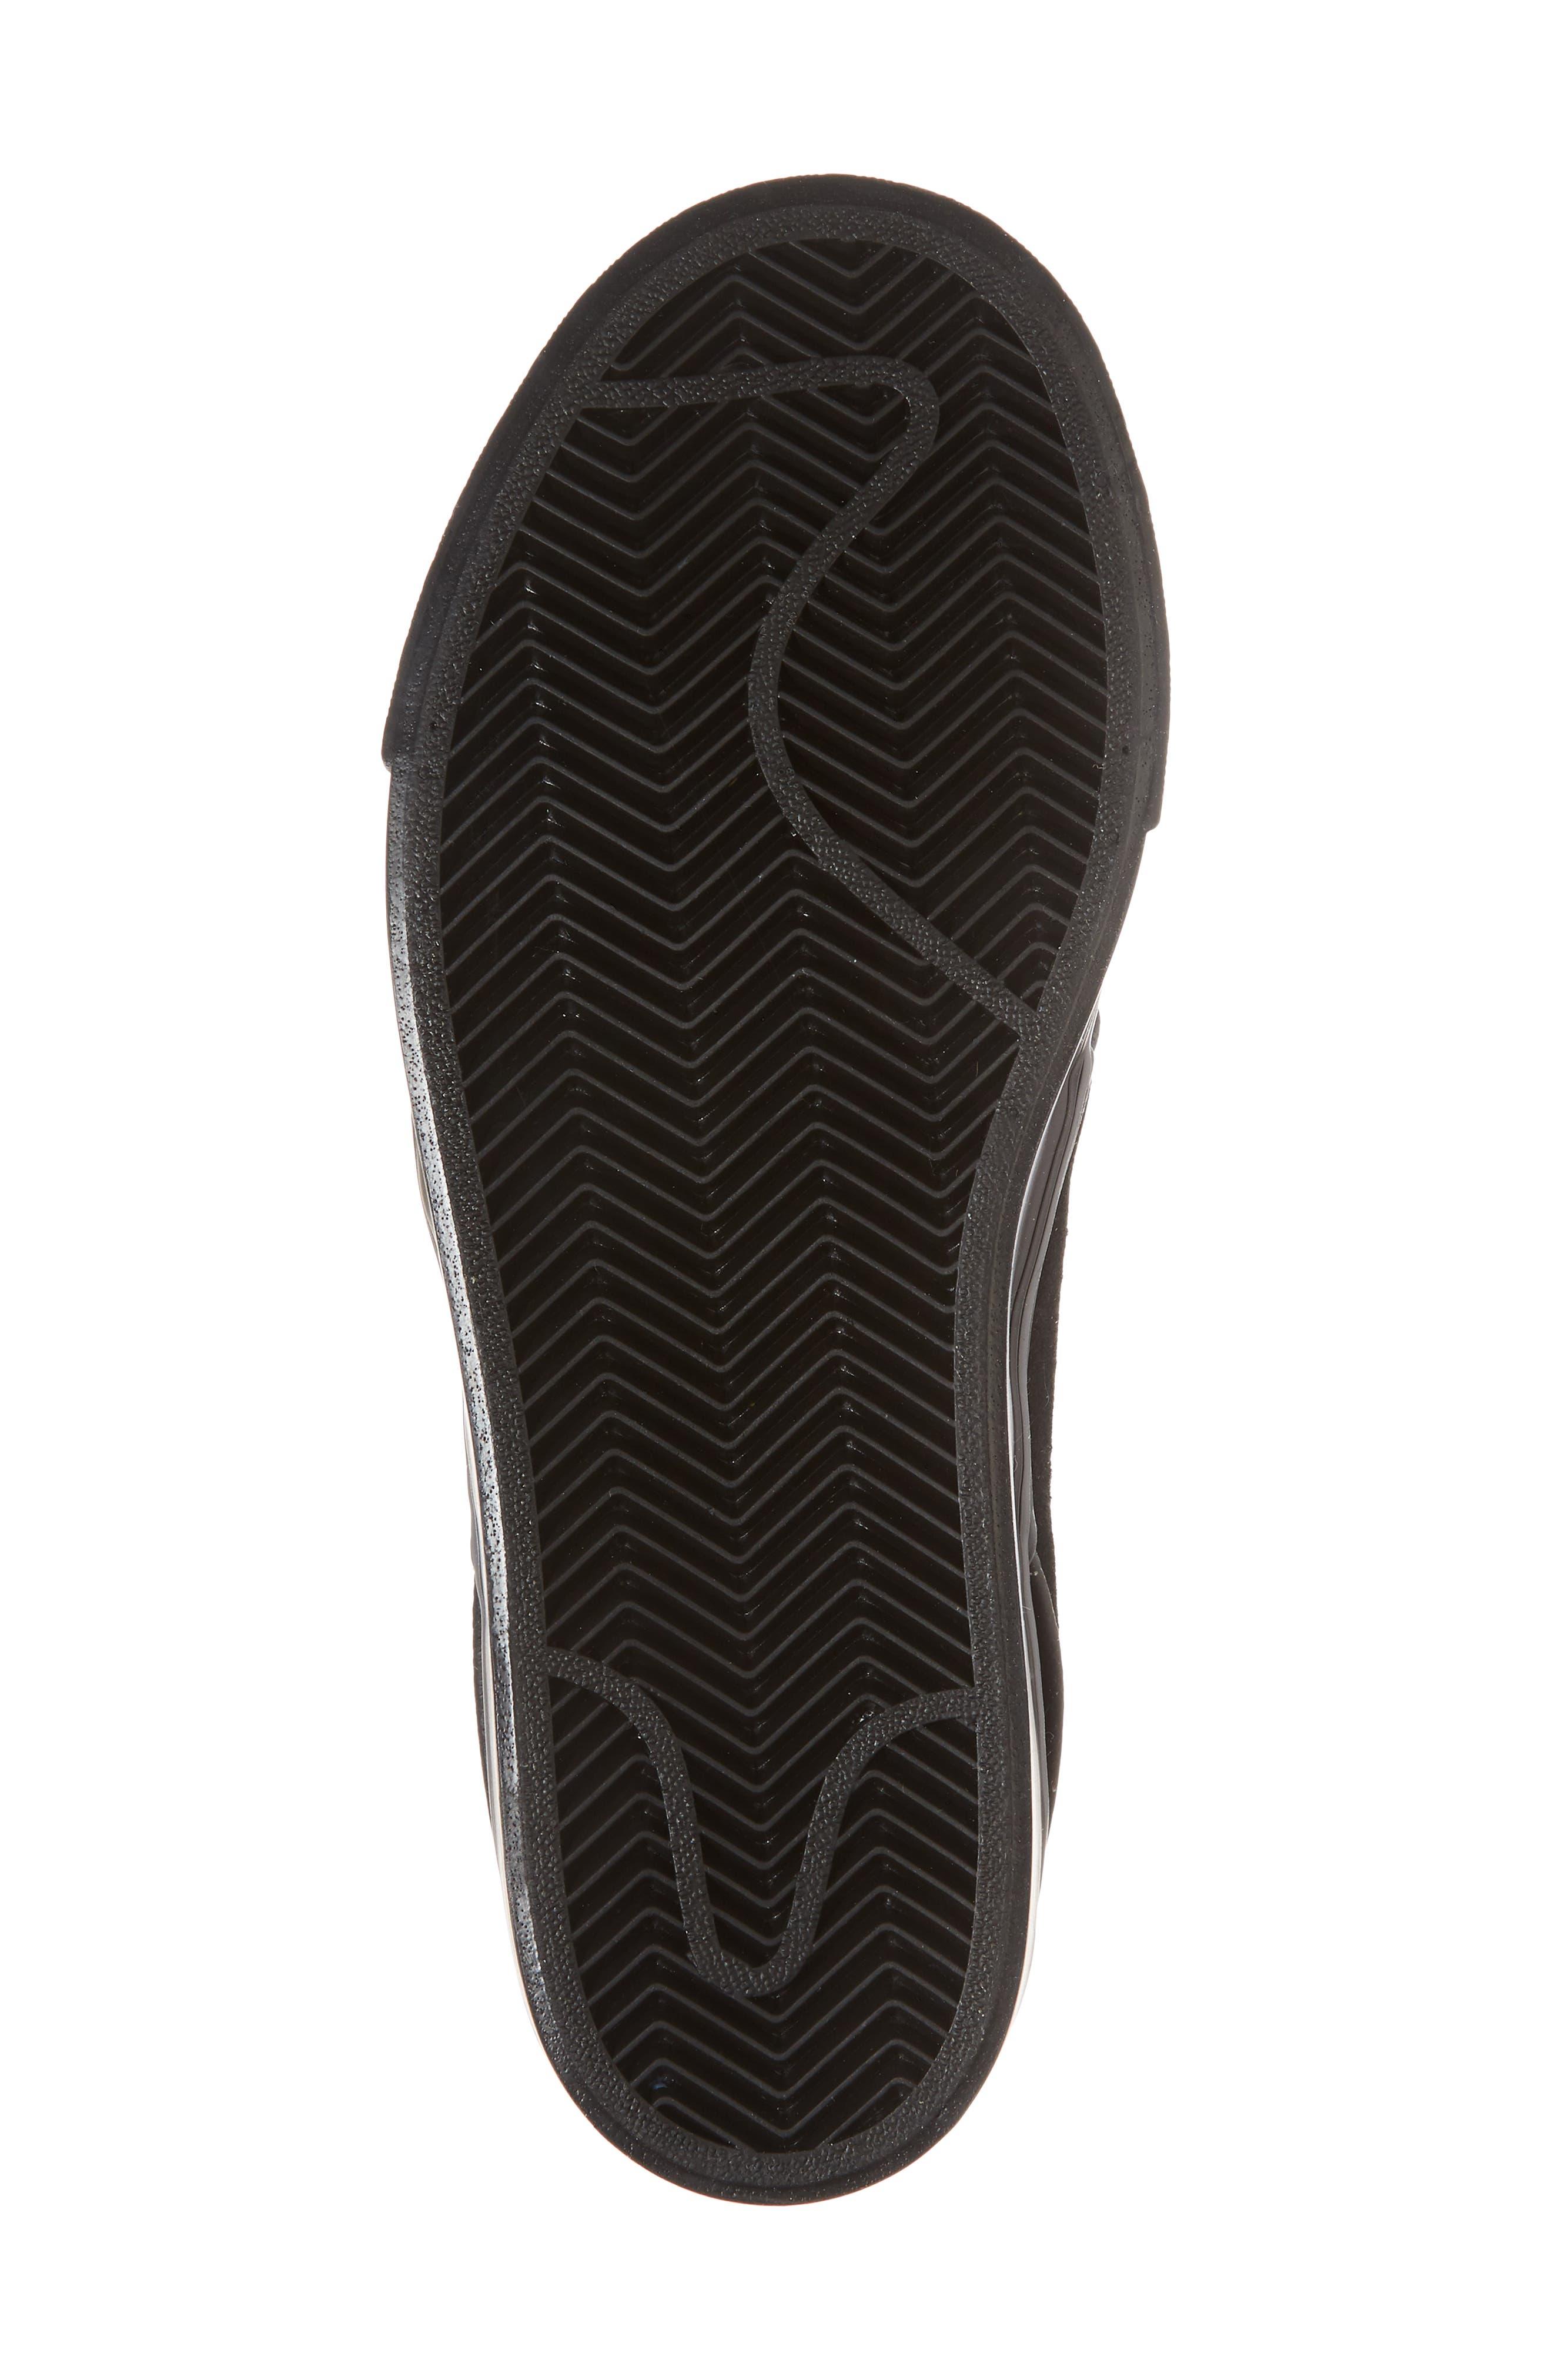 SB Air Zoom Stefan Janoski Skate Sneaker,                             Alternate thumbnail 6, color,                             BLACK/ BLACK/ BLACK